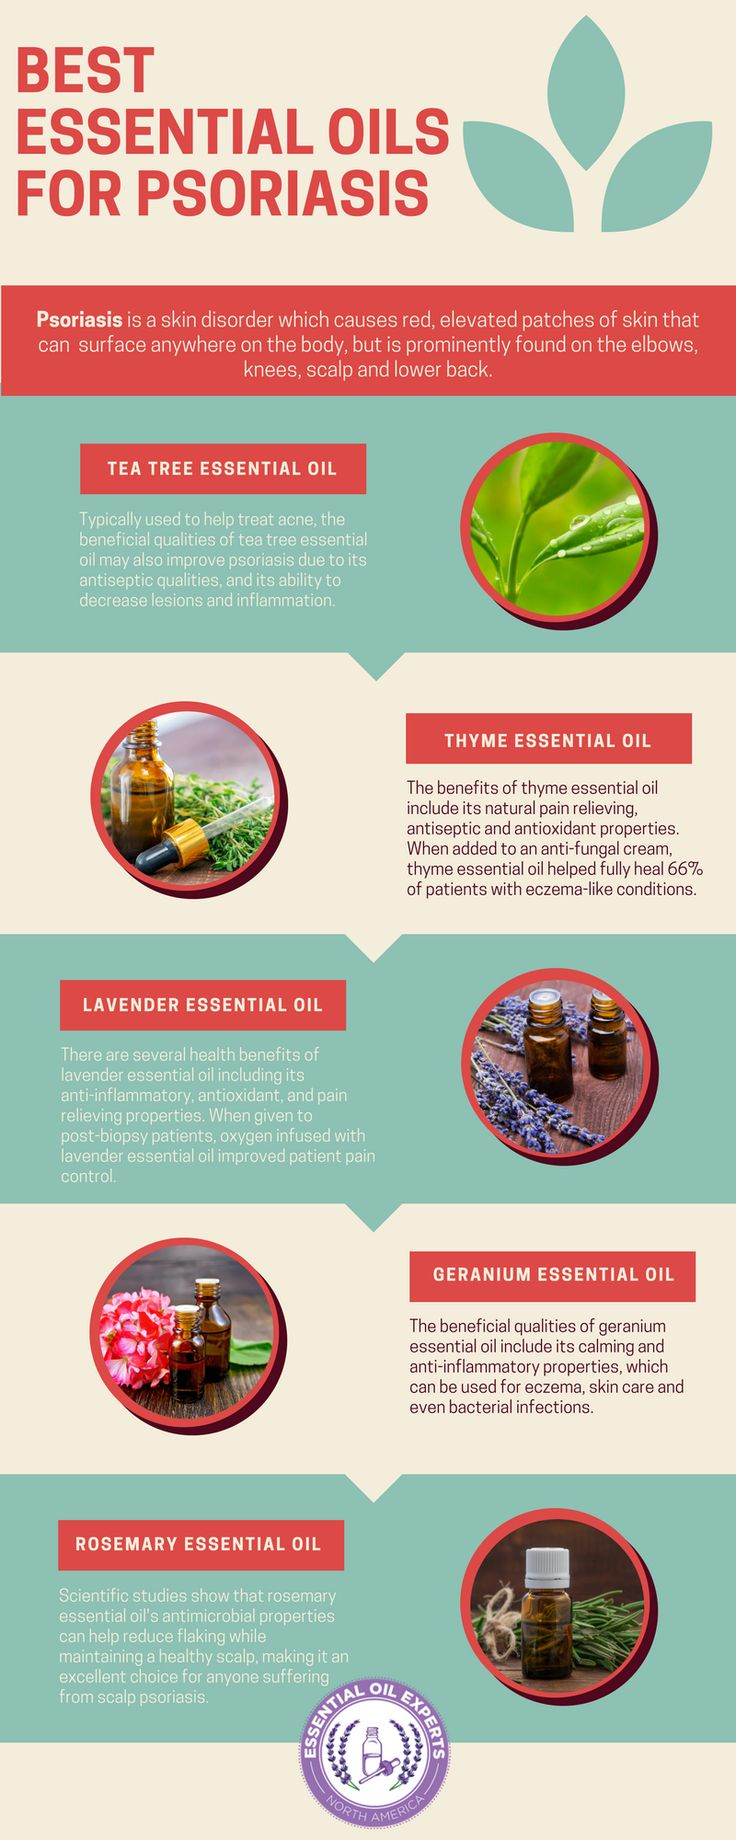 Best Essential Oils for Psoriasis - Recipe & Tea Tree Oil for Psoriasis